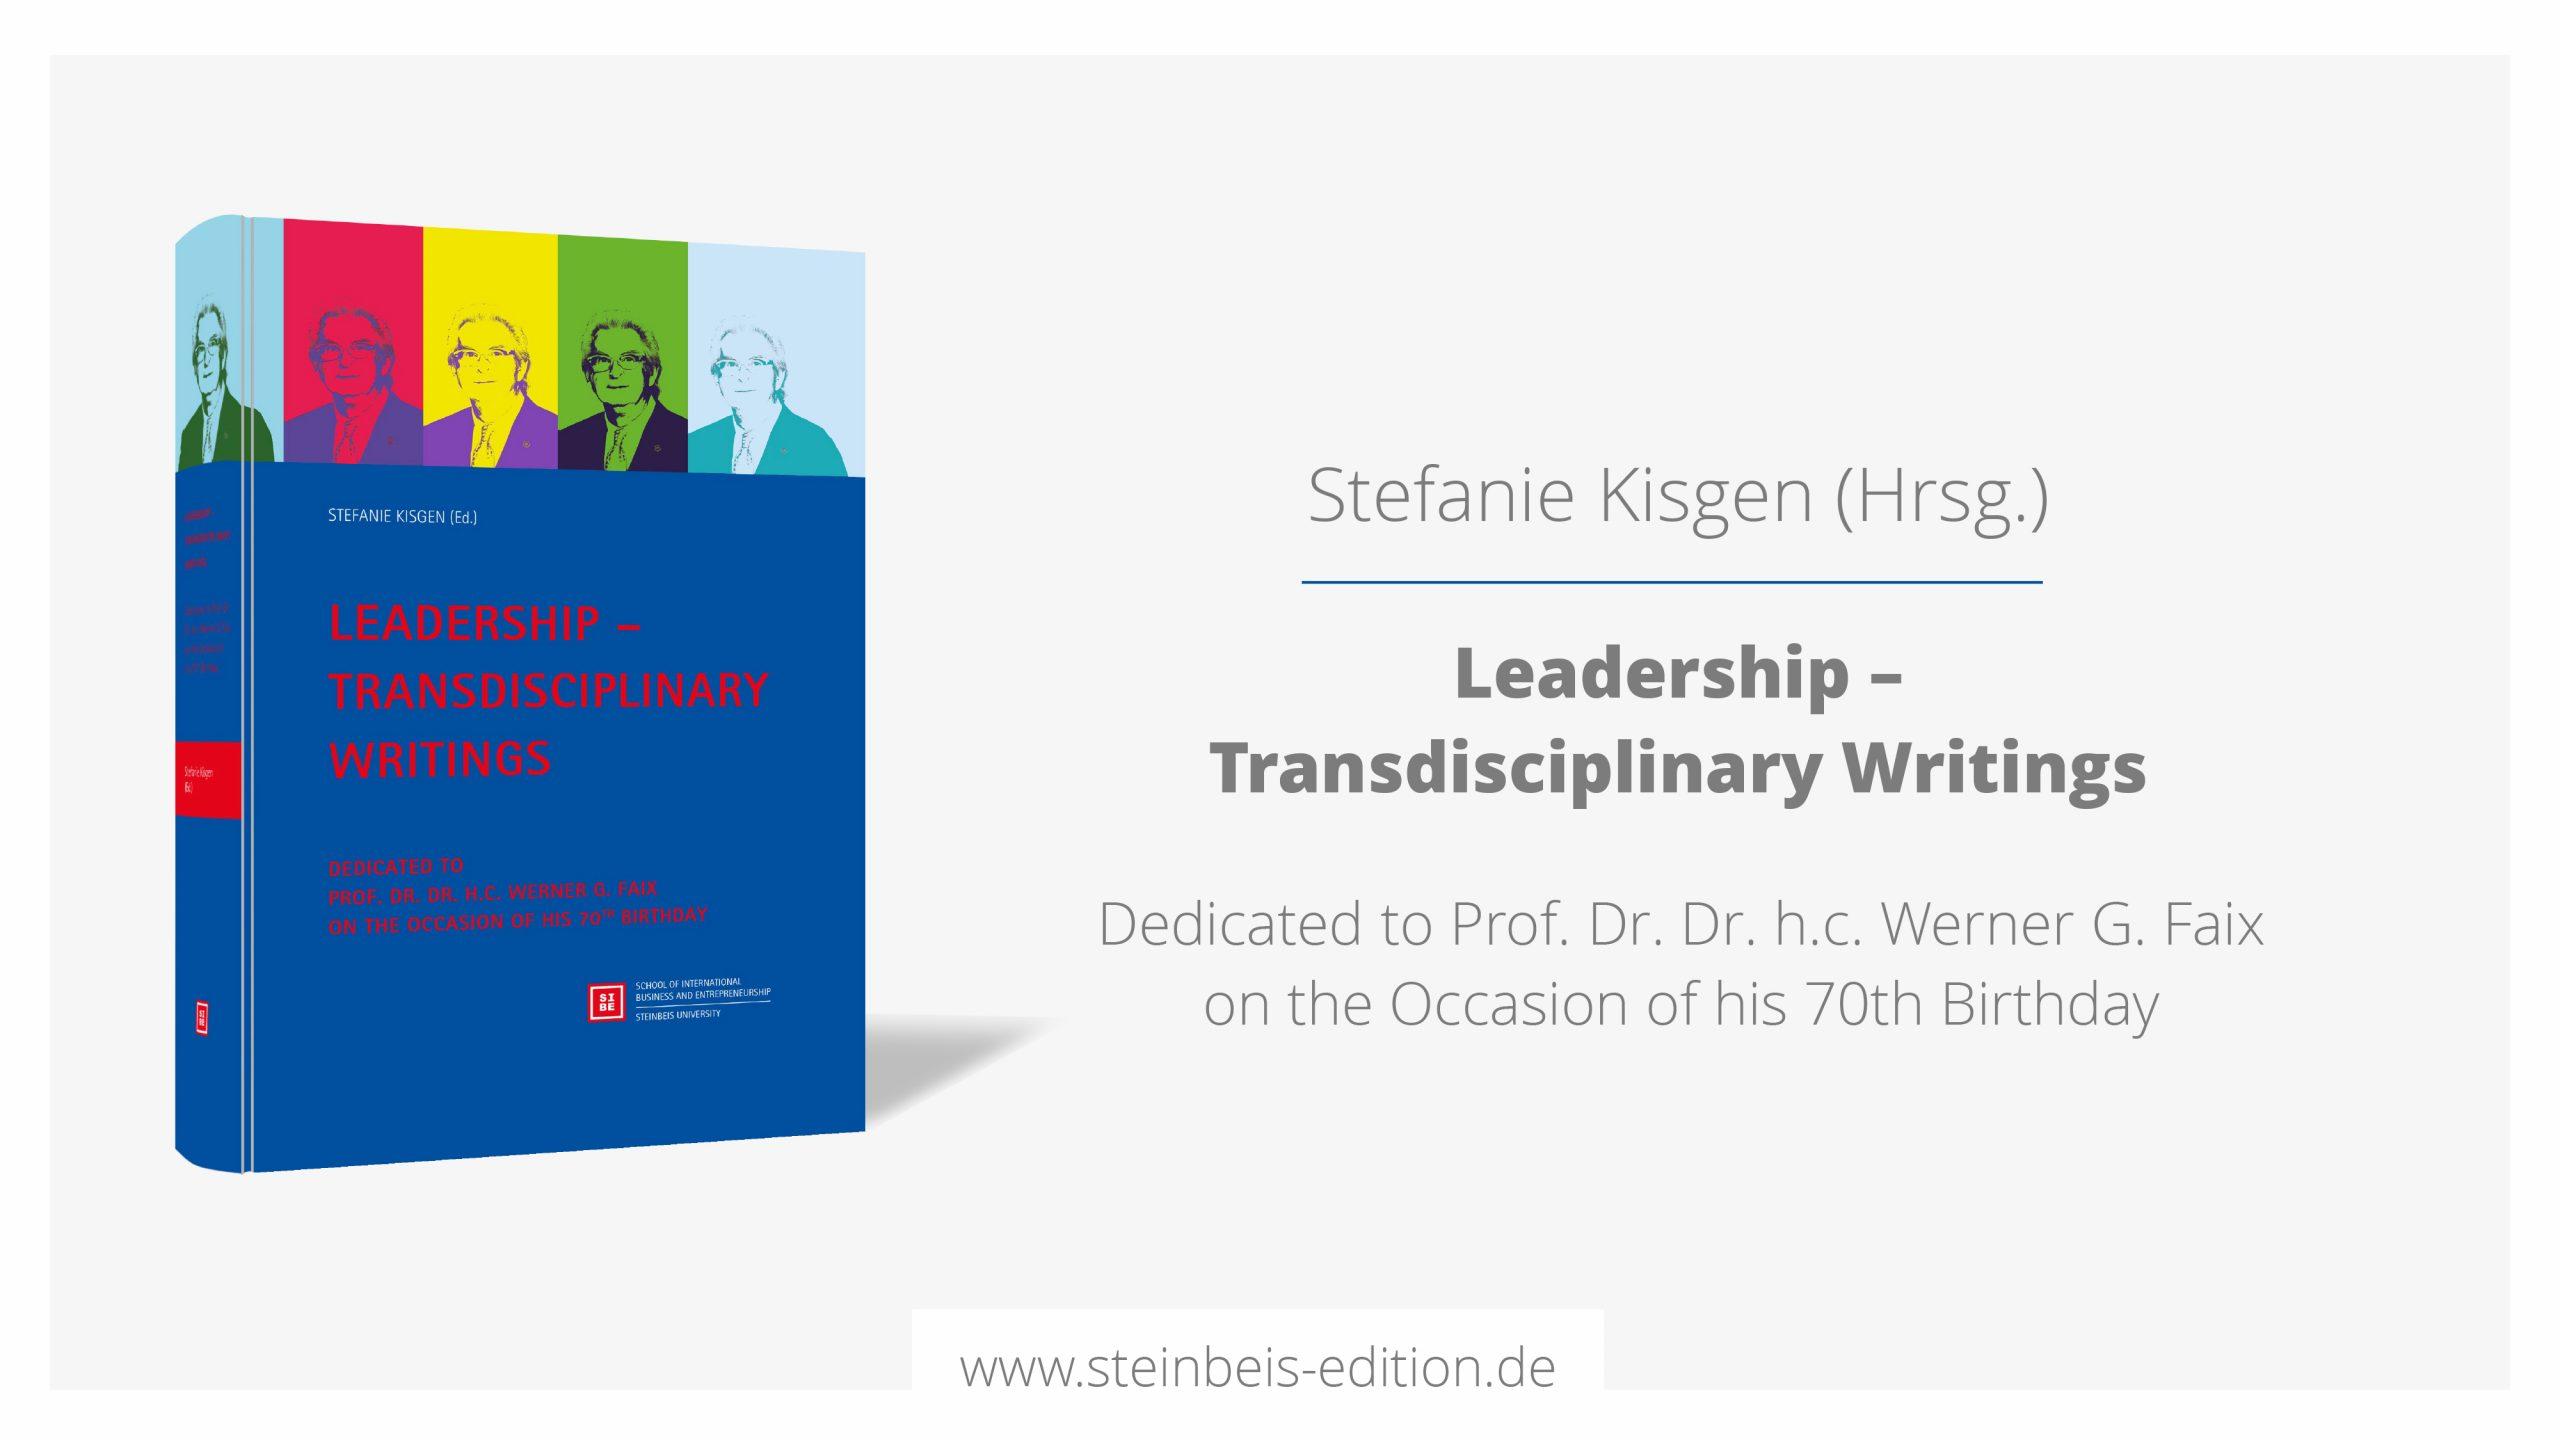 Festschrift: Leadership – Transdisciplinary writings